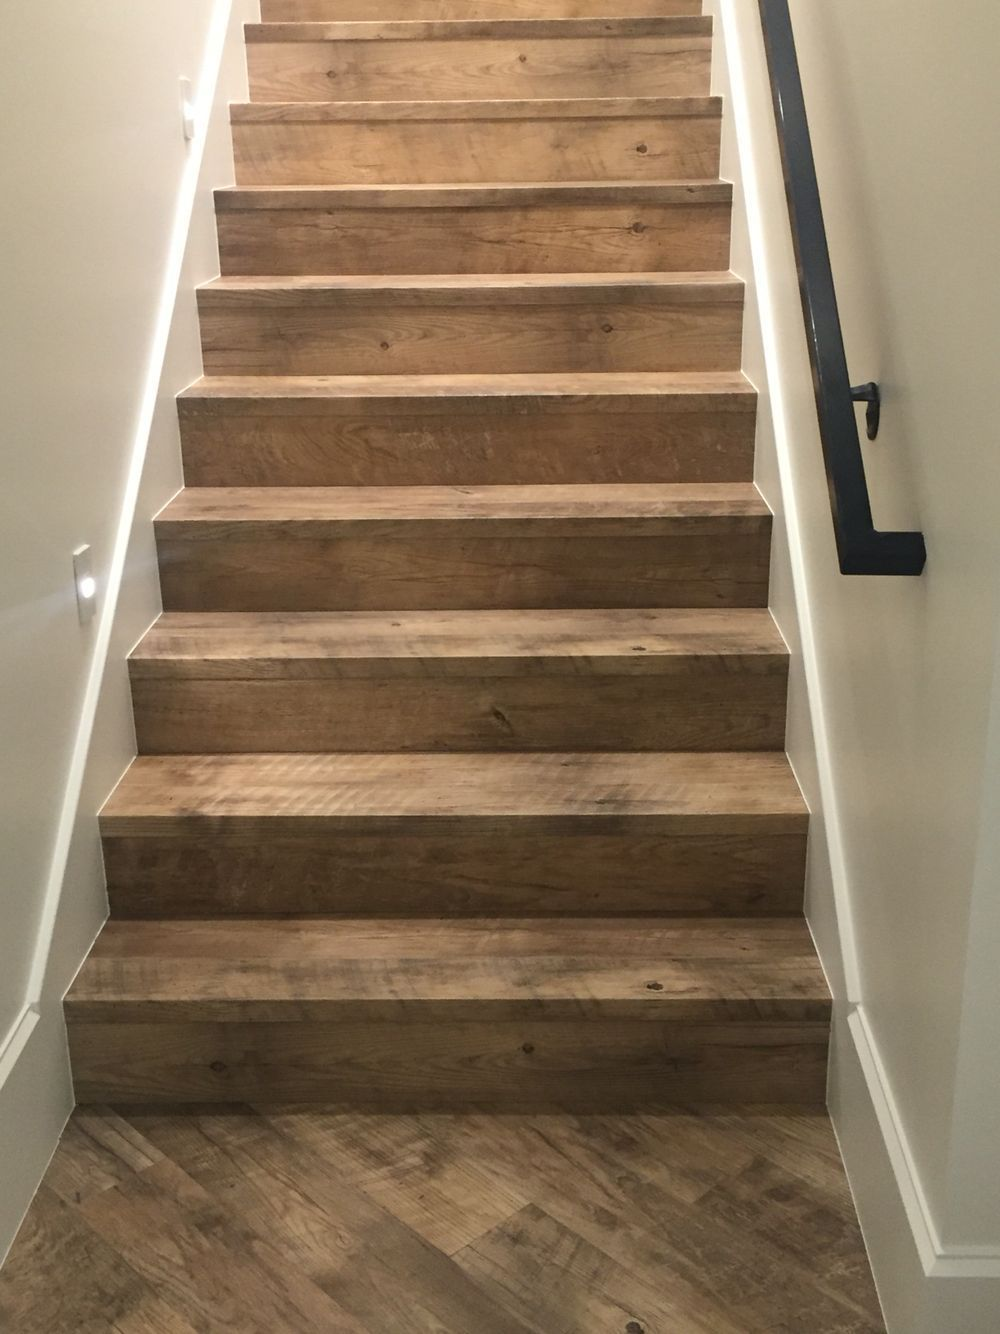 ROUGH WOOD STAIRS basementstairrailing Diy stairs